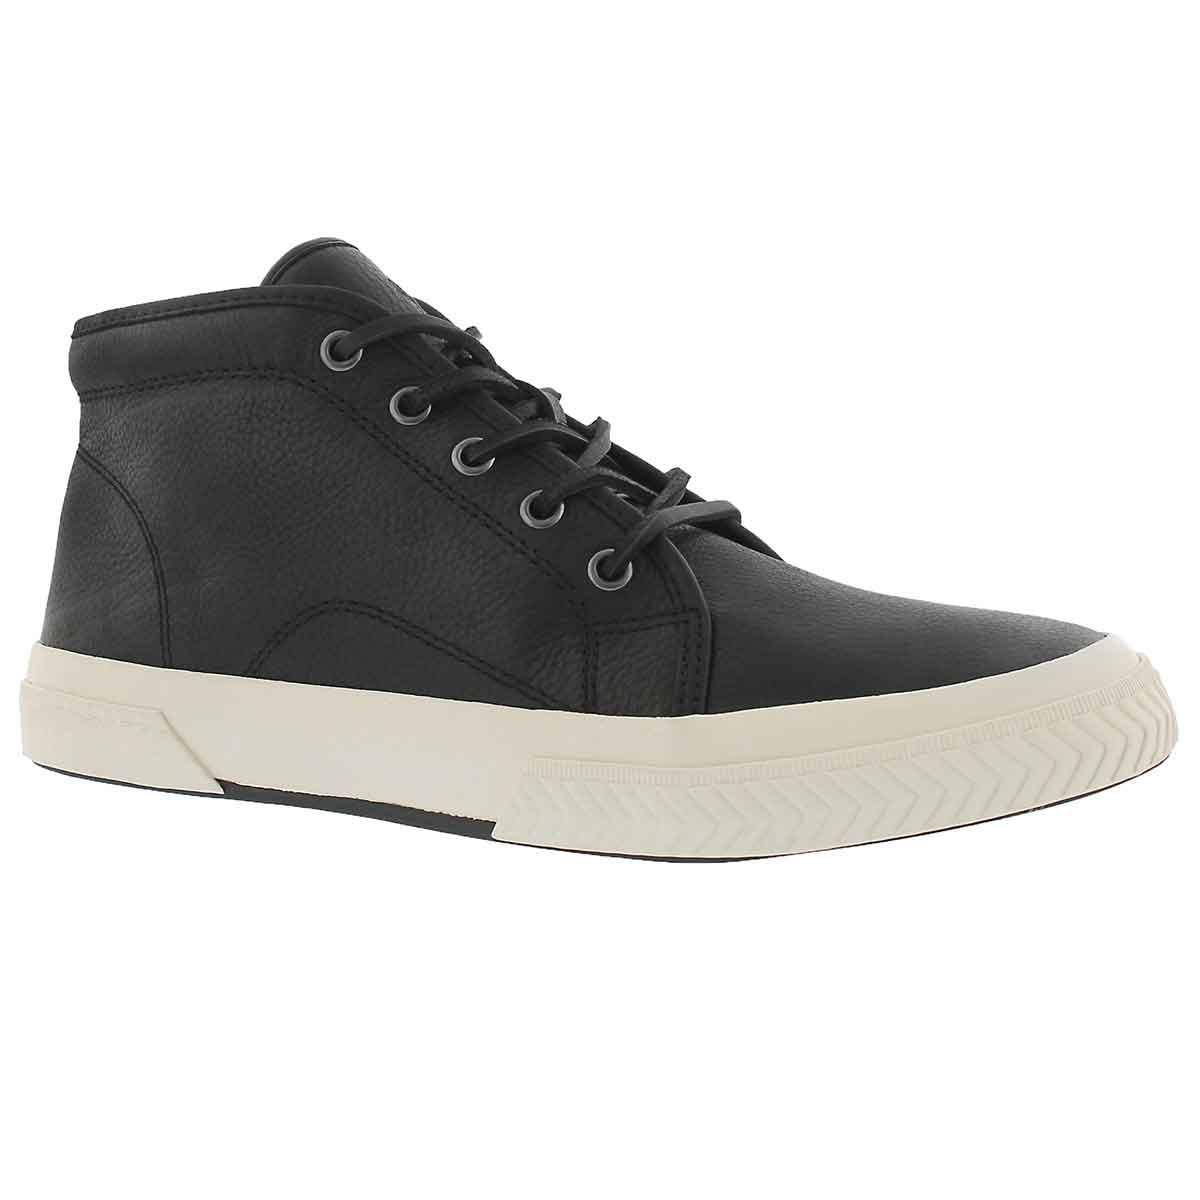 Mns Thurlos black high top sneaker